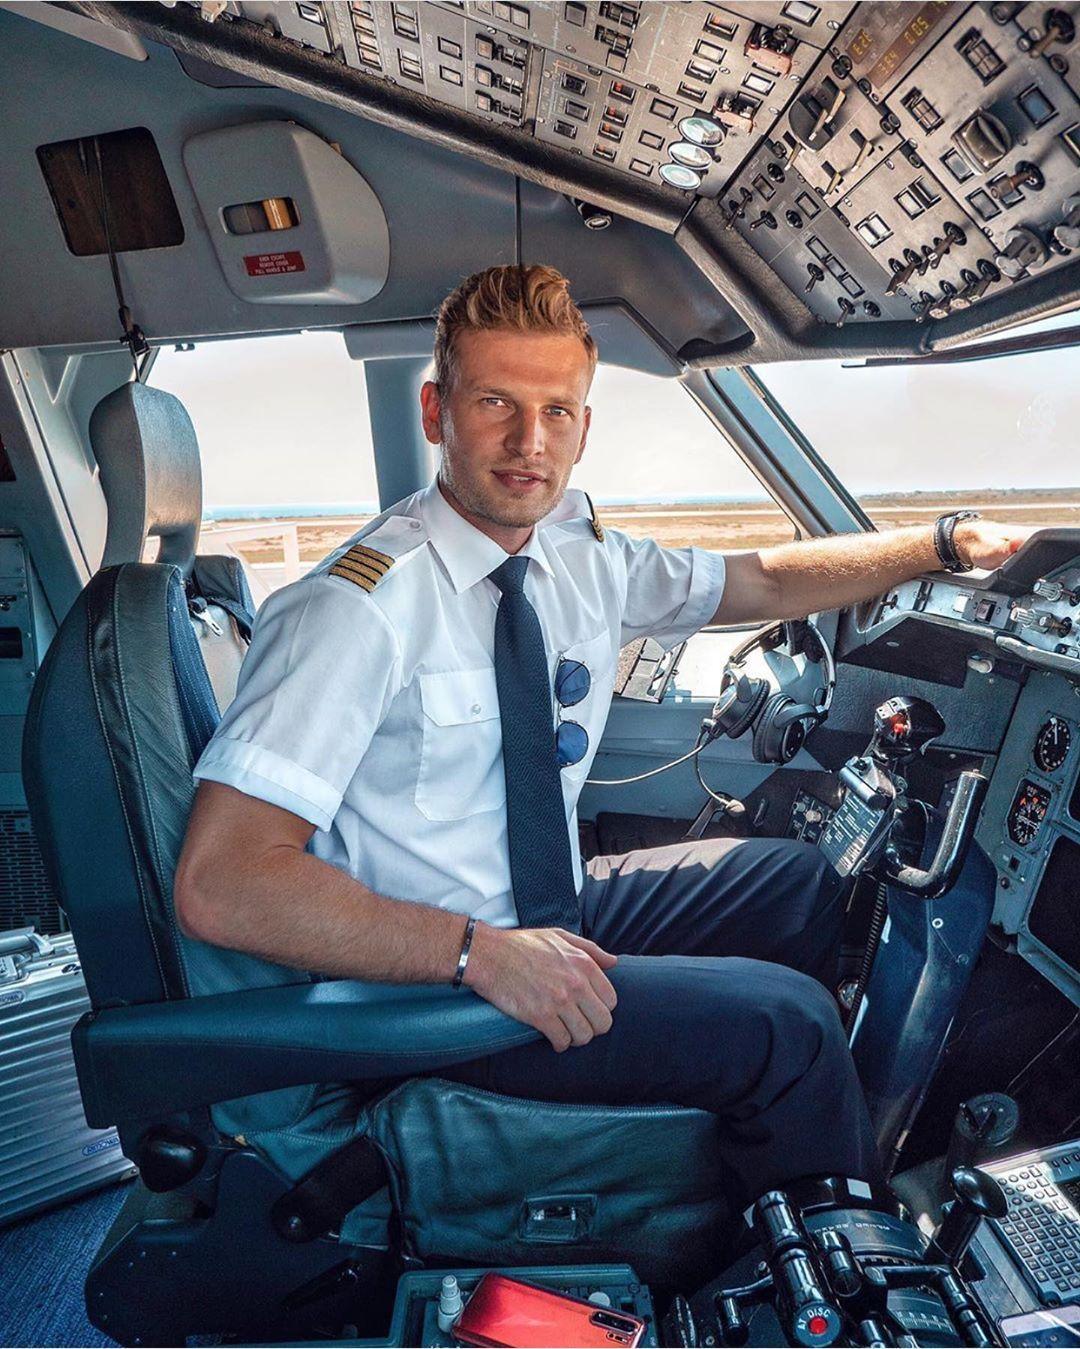 airline pilot,pilot,pilots,airlines,airline,american